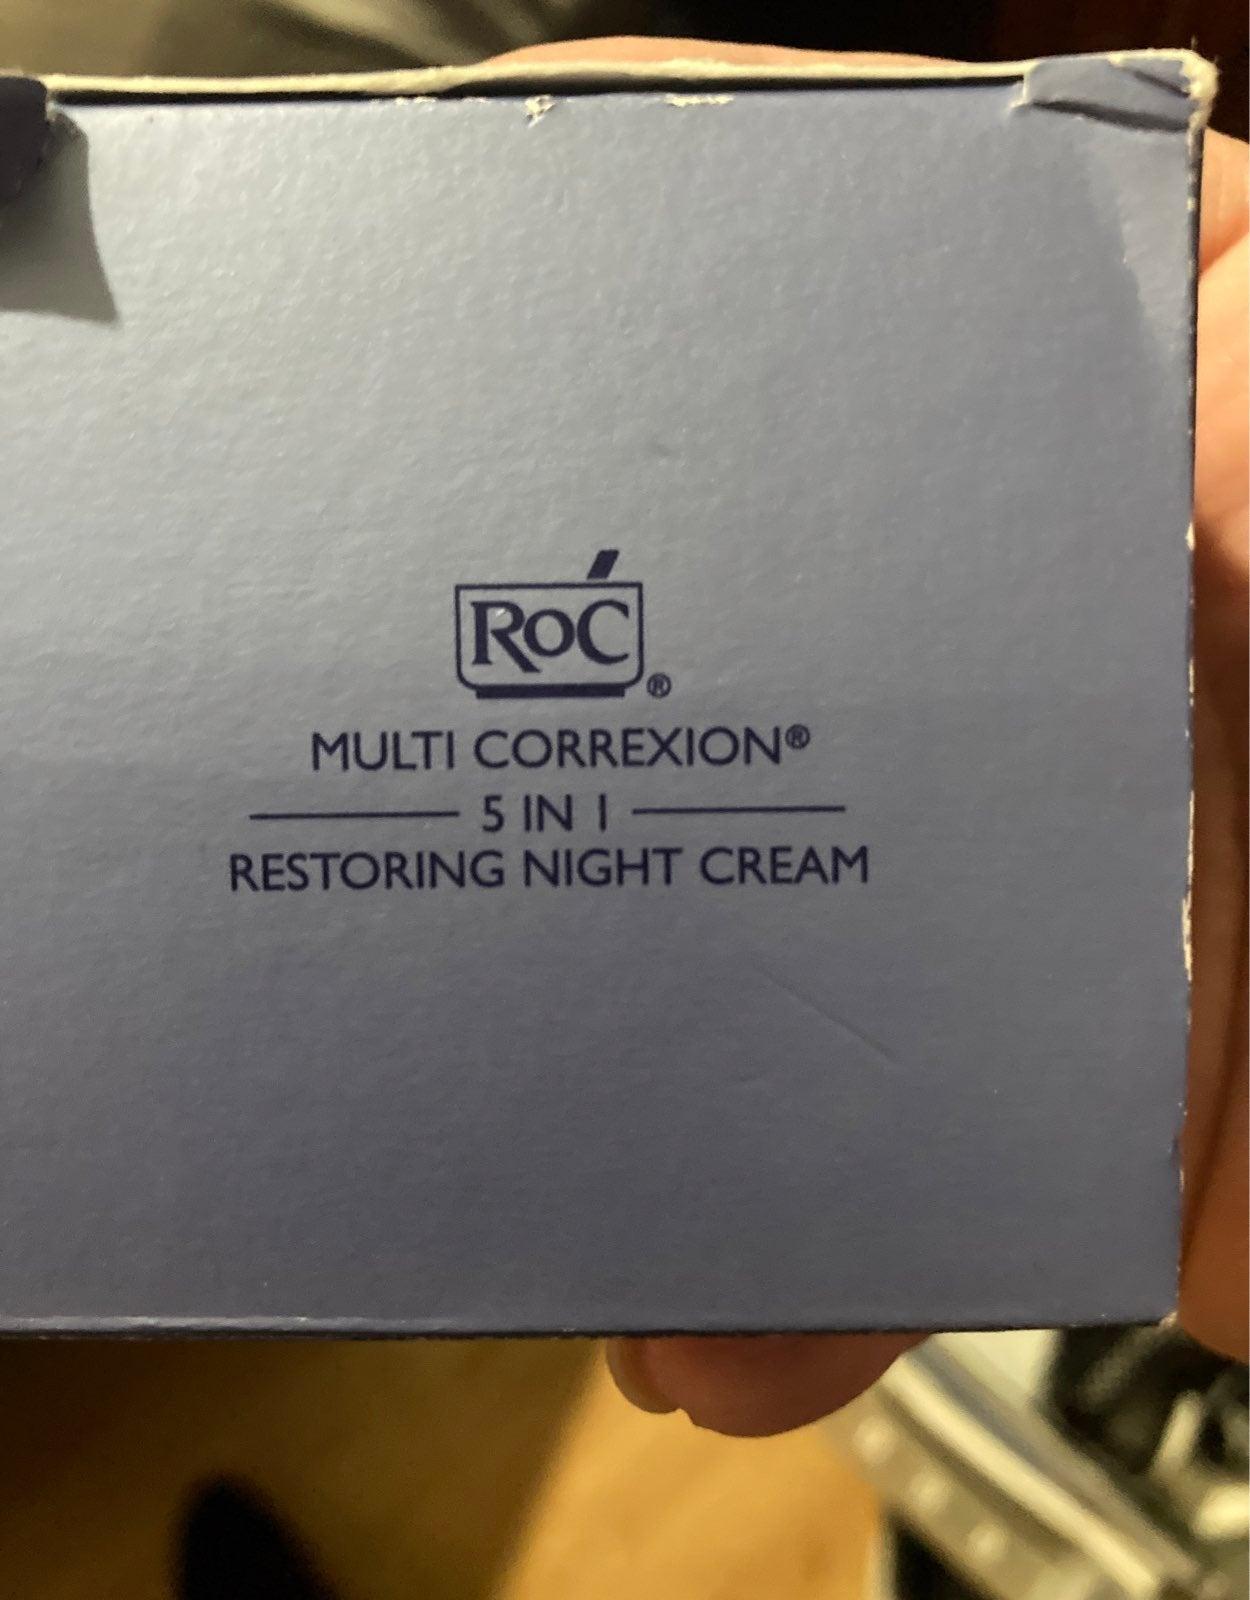 ROC Multi Correxion 5in1 Restoring cream